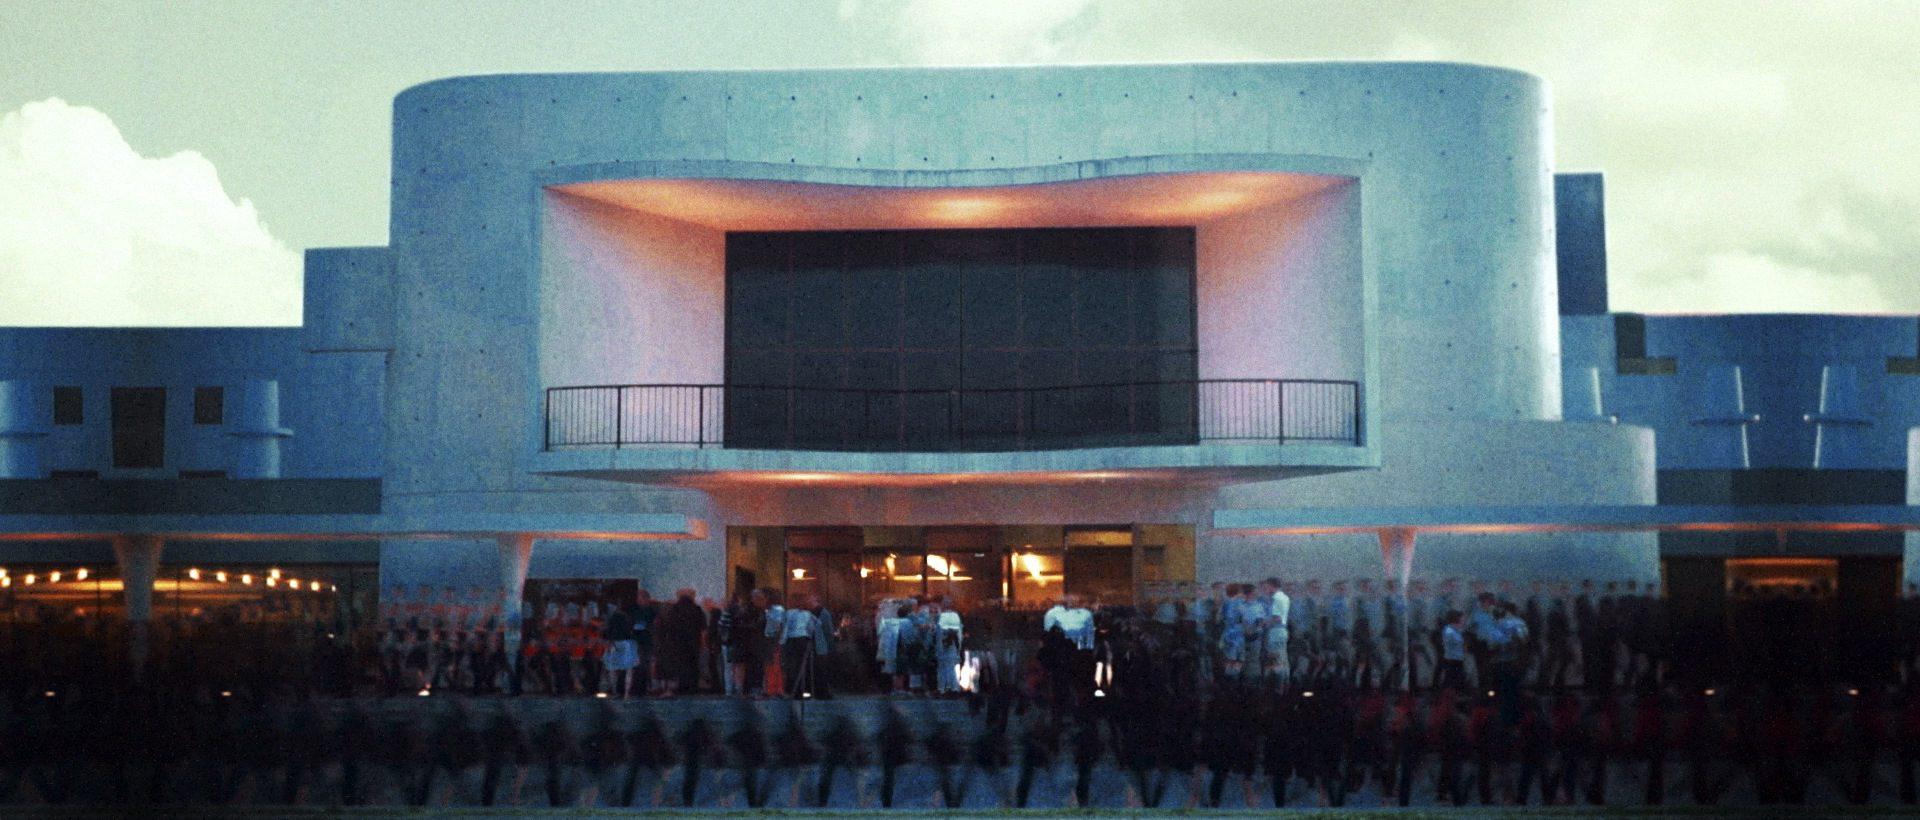 Stadttheater. Aus Stadt, Licht & Bewegung